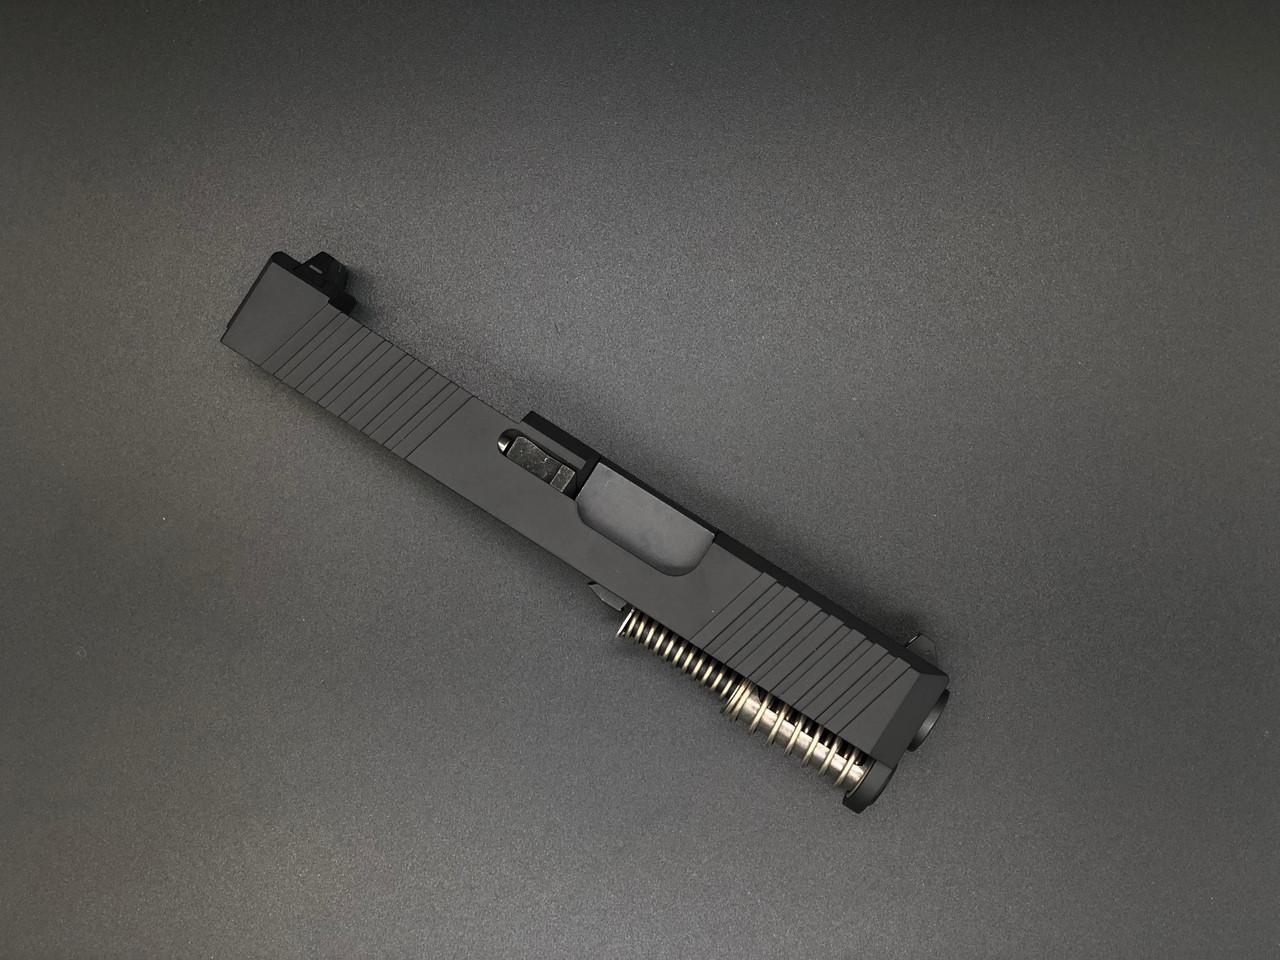 MDX Arms G26 V2 9mm Complete Slide with RMR Cut